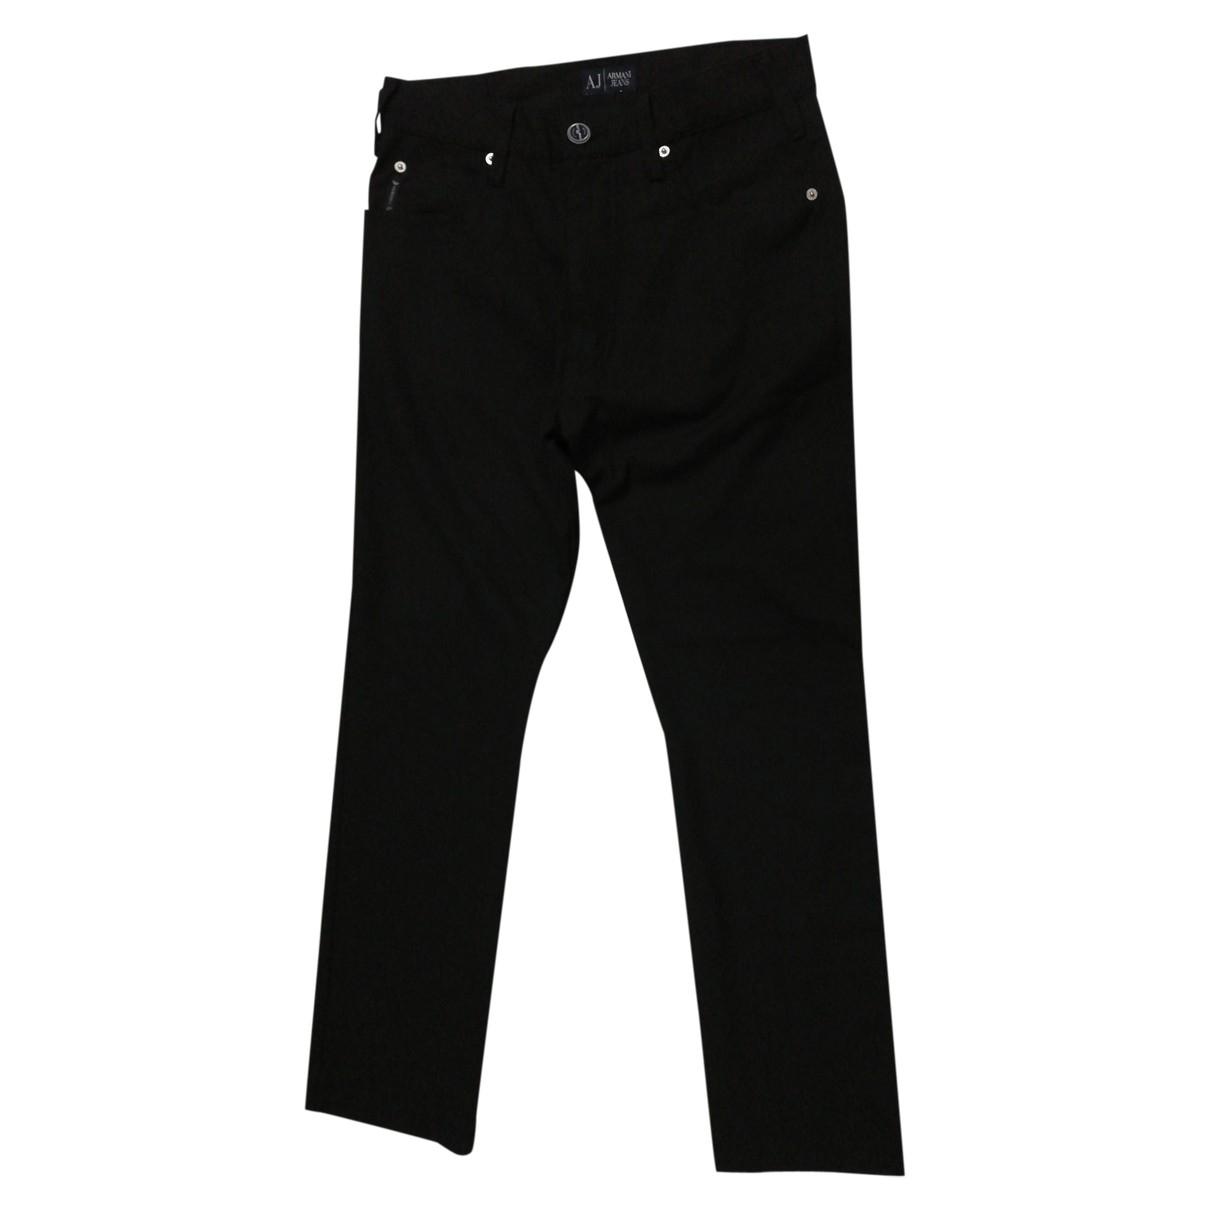 Armani Jeans \N Black Trousers for Men 30 UK - US